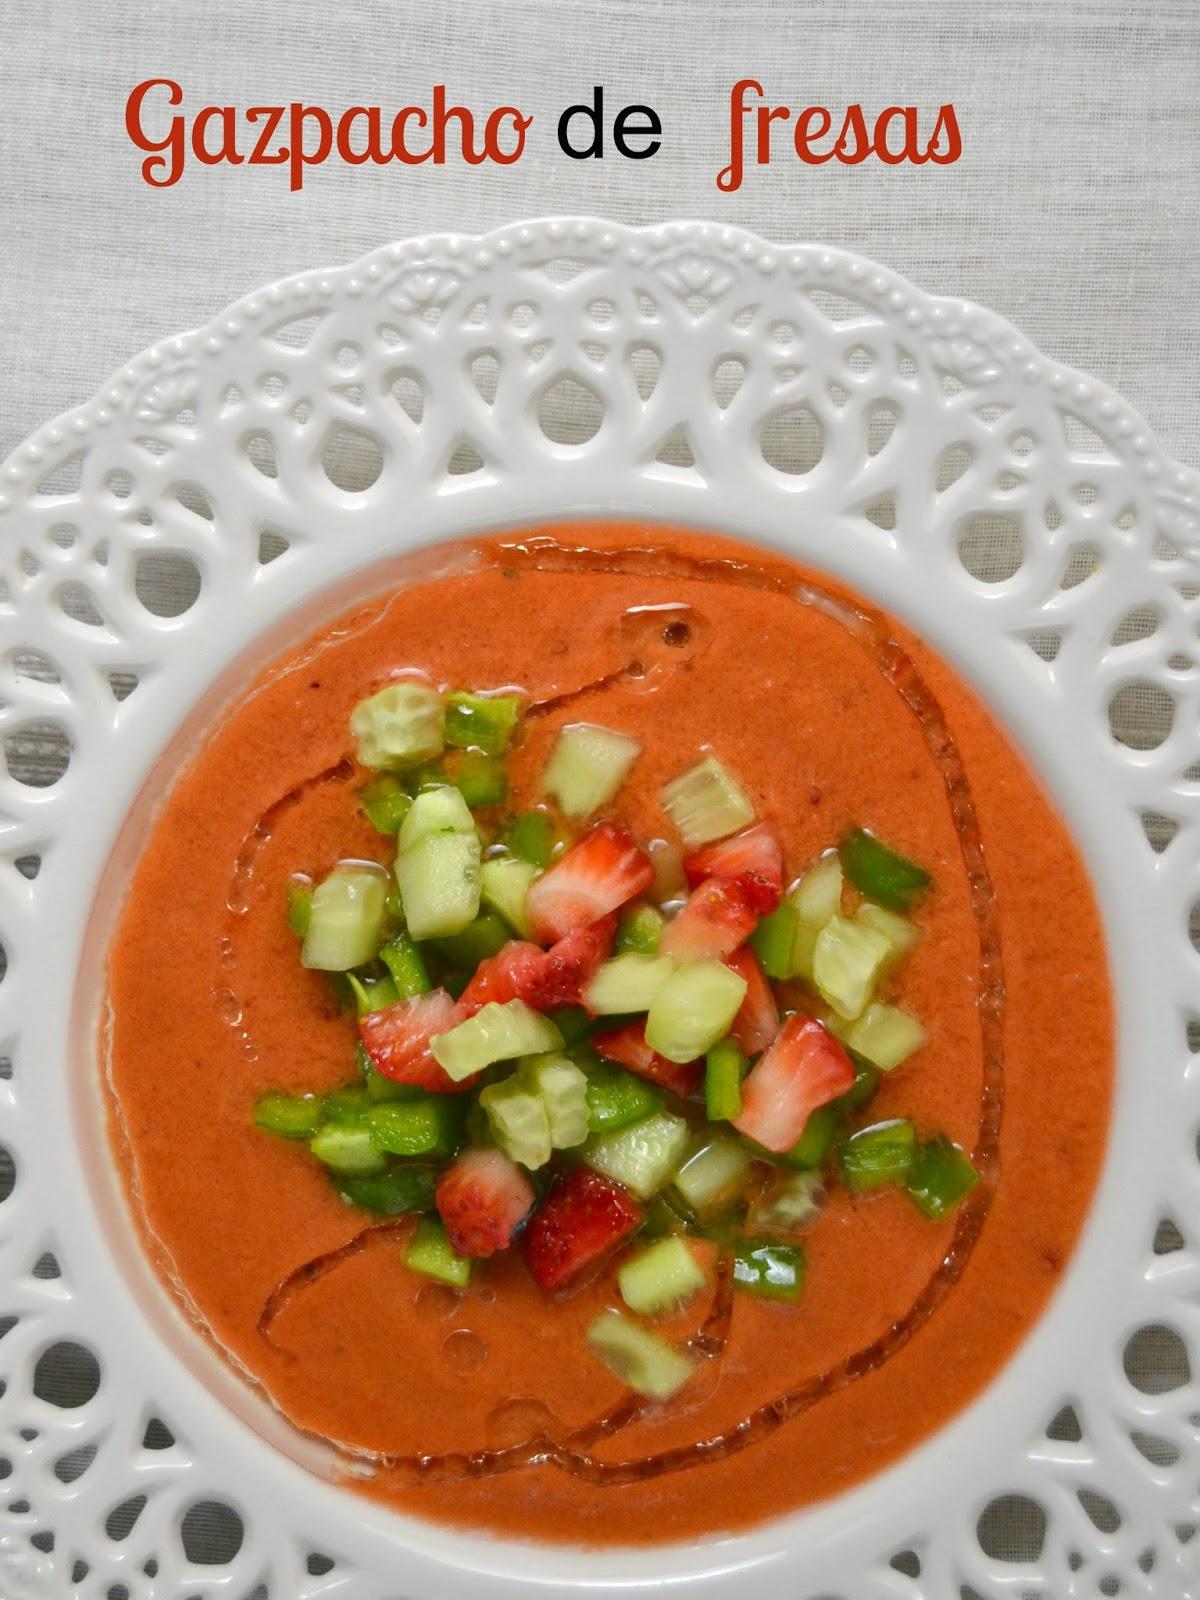 Gazpacho de fresas | Cuuking! Recetas de cocina